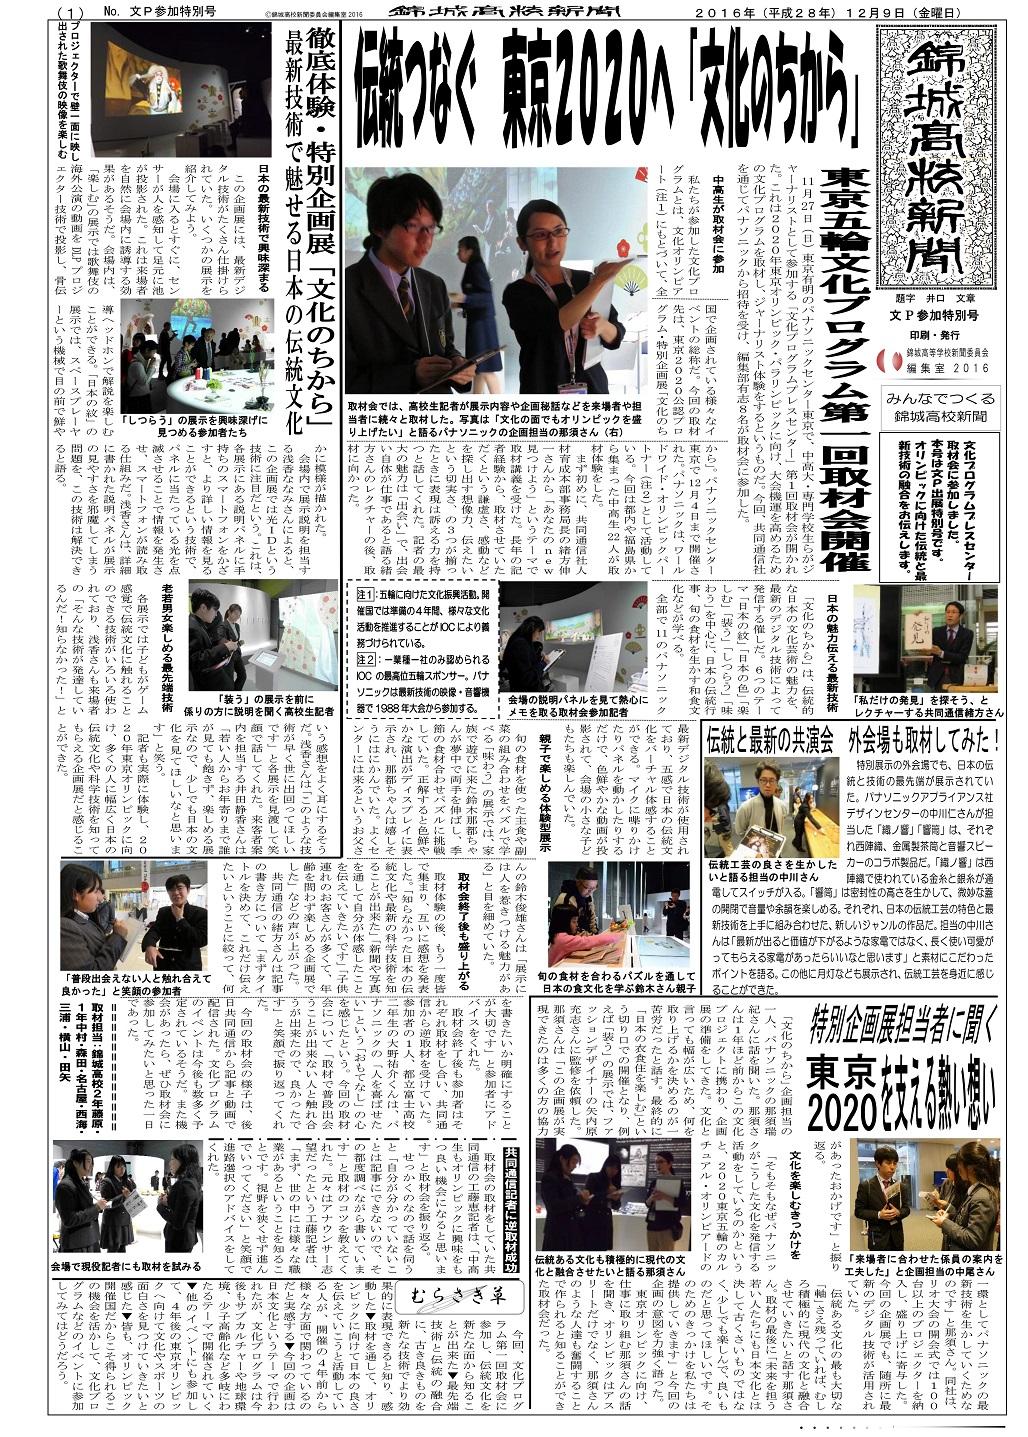 http://bunp.47news.jp/event/images/1no4akinjo-np201611.jpg